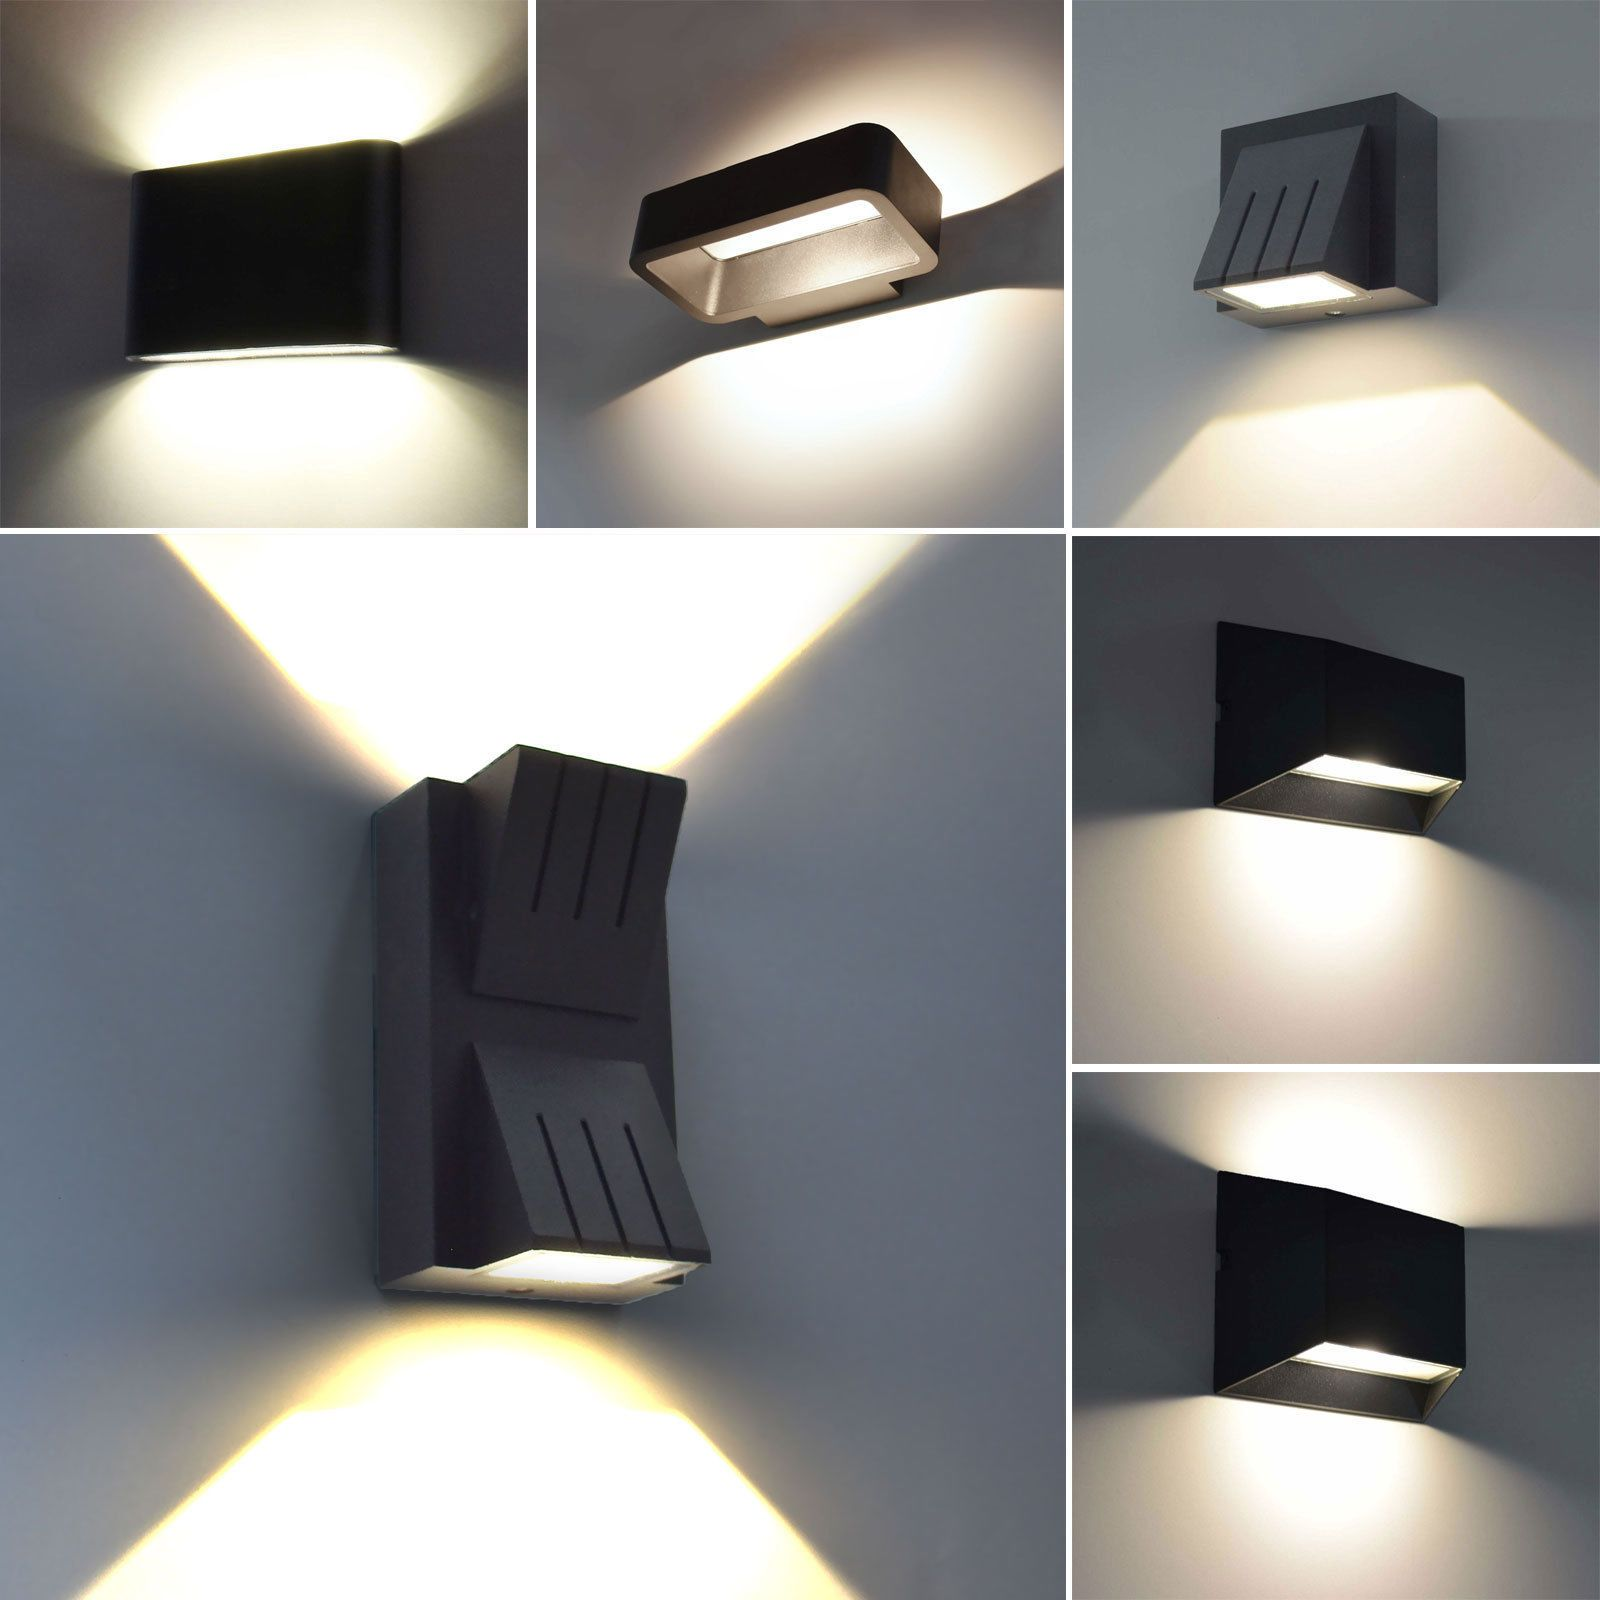 Moderne Led Aussenleuchte Wandleuchte Aussenlampe Up Down Lampe